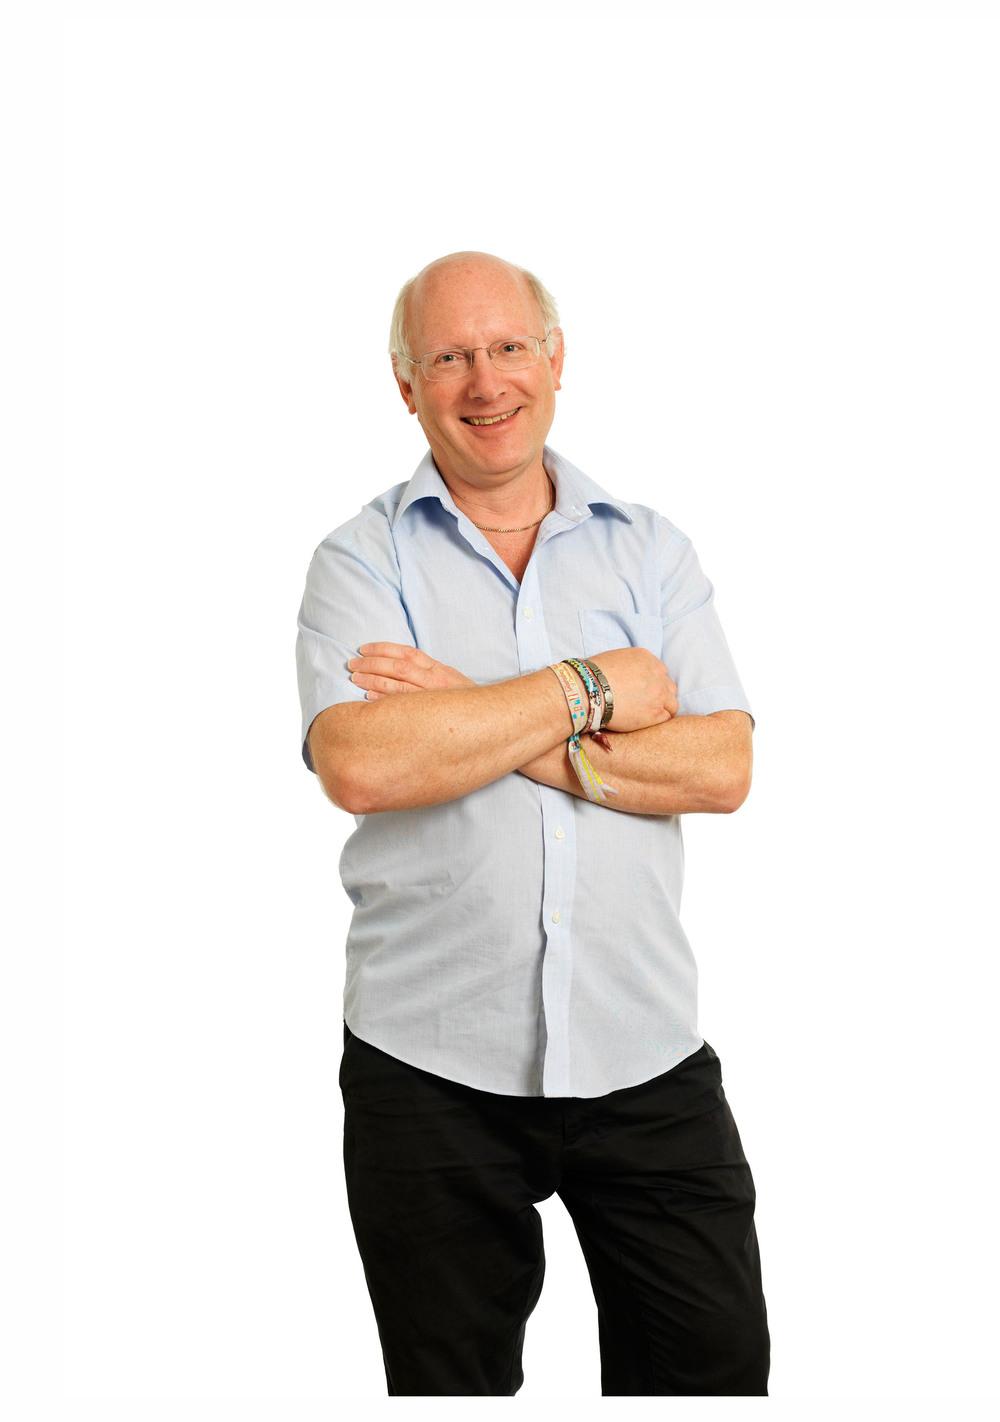 Andy Rampton